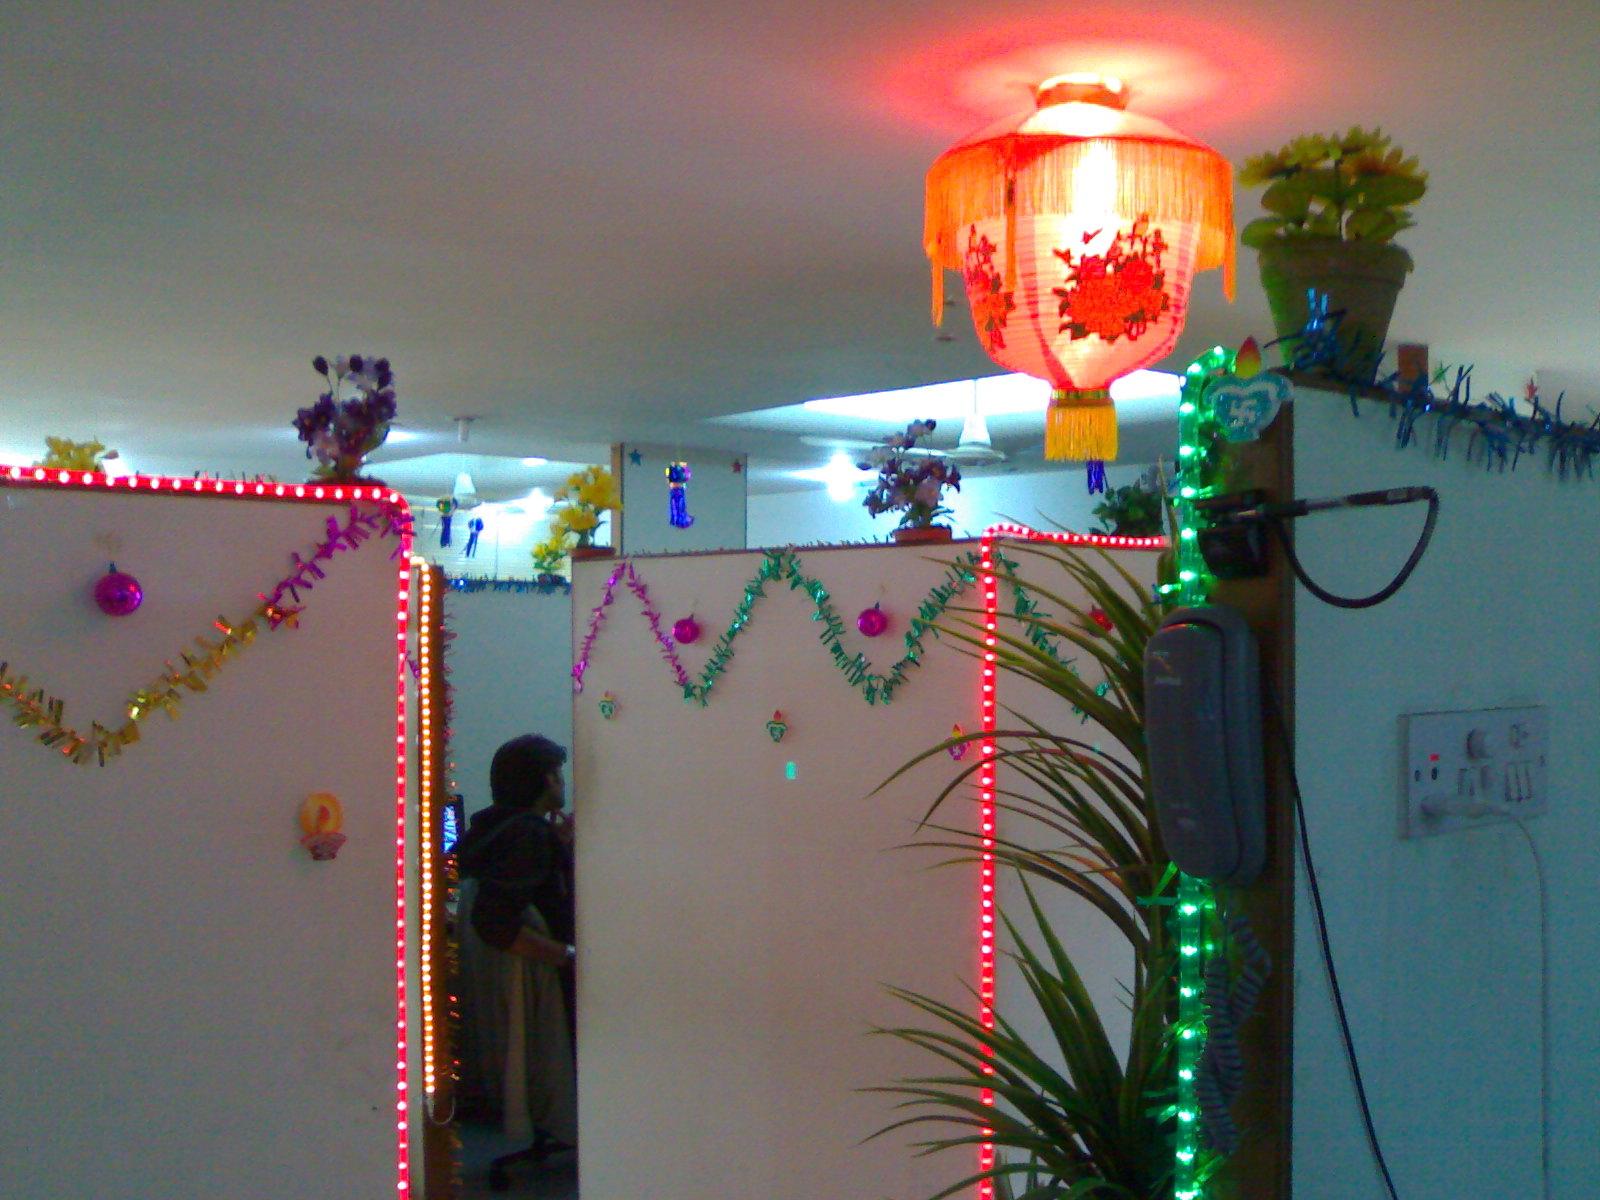 dhan trayodashi wallpapers - photo #44